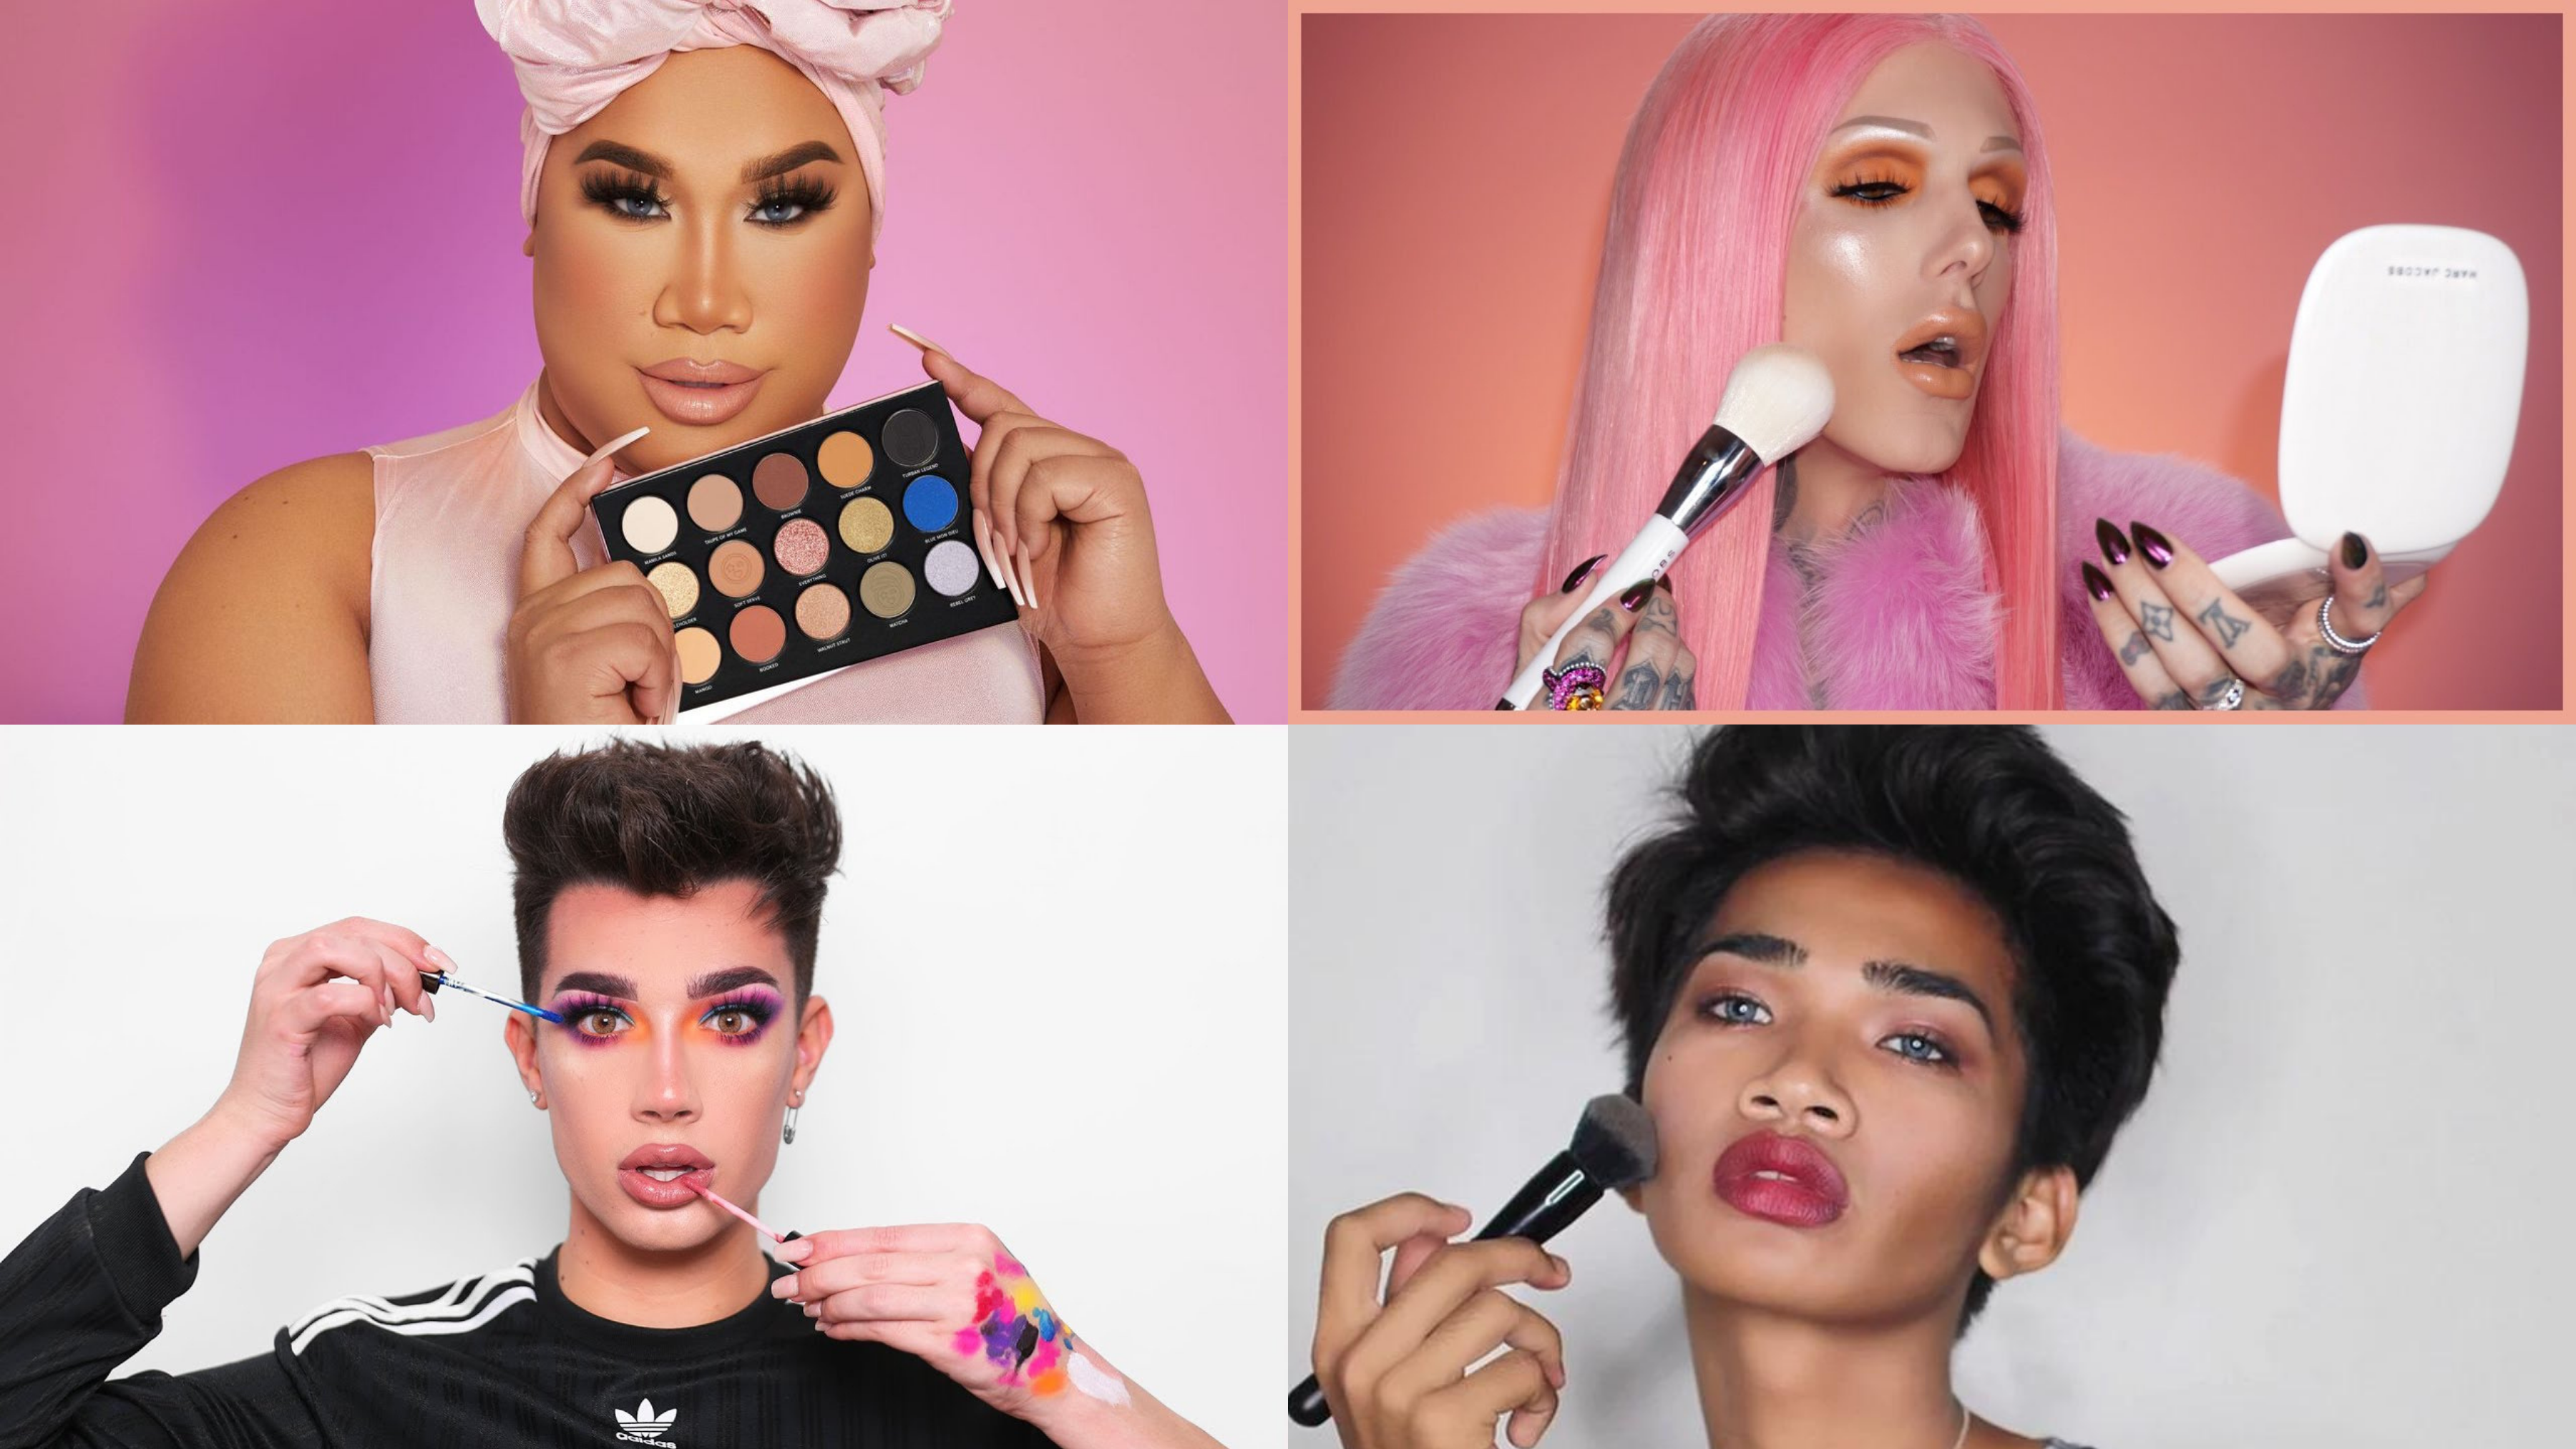 male beauty, beauty gurus, youtuber, James Charles, Patrick Starr, jefrey star, bretman rock, makeup tutorial, viral video